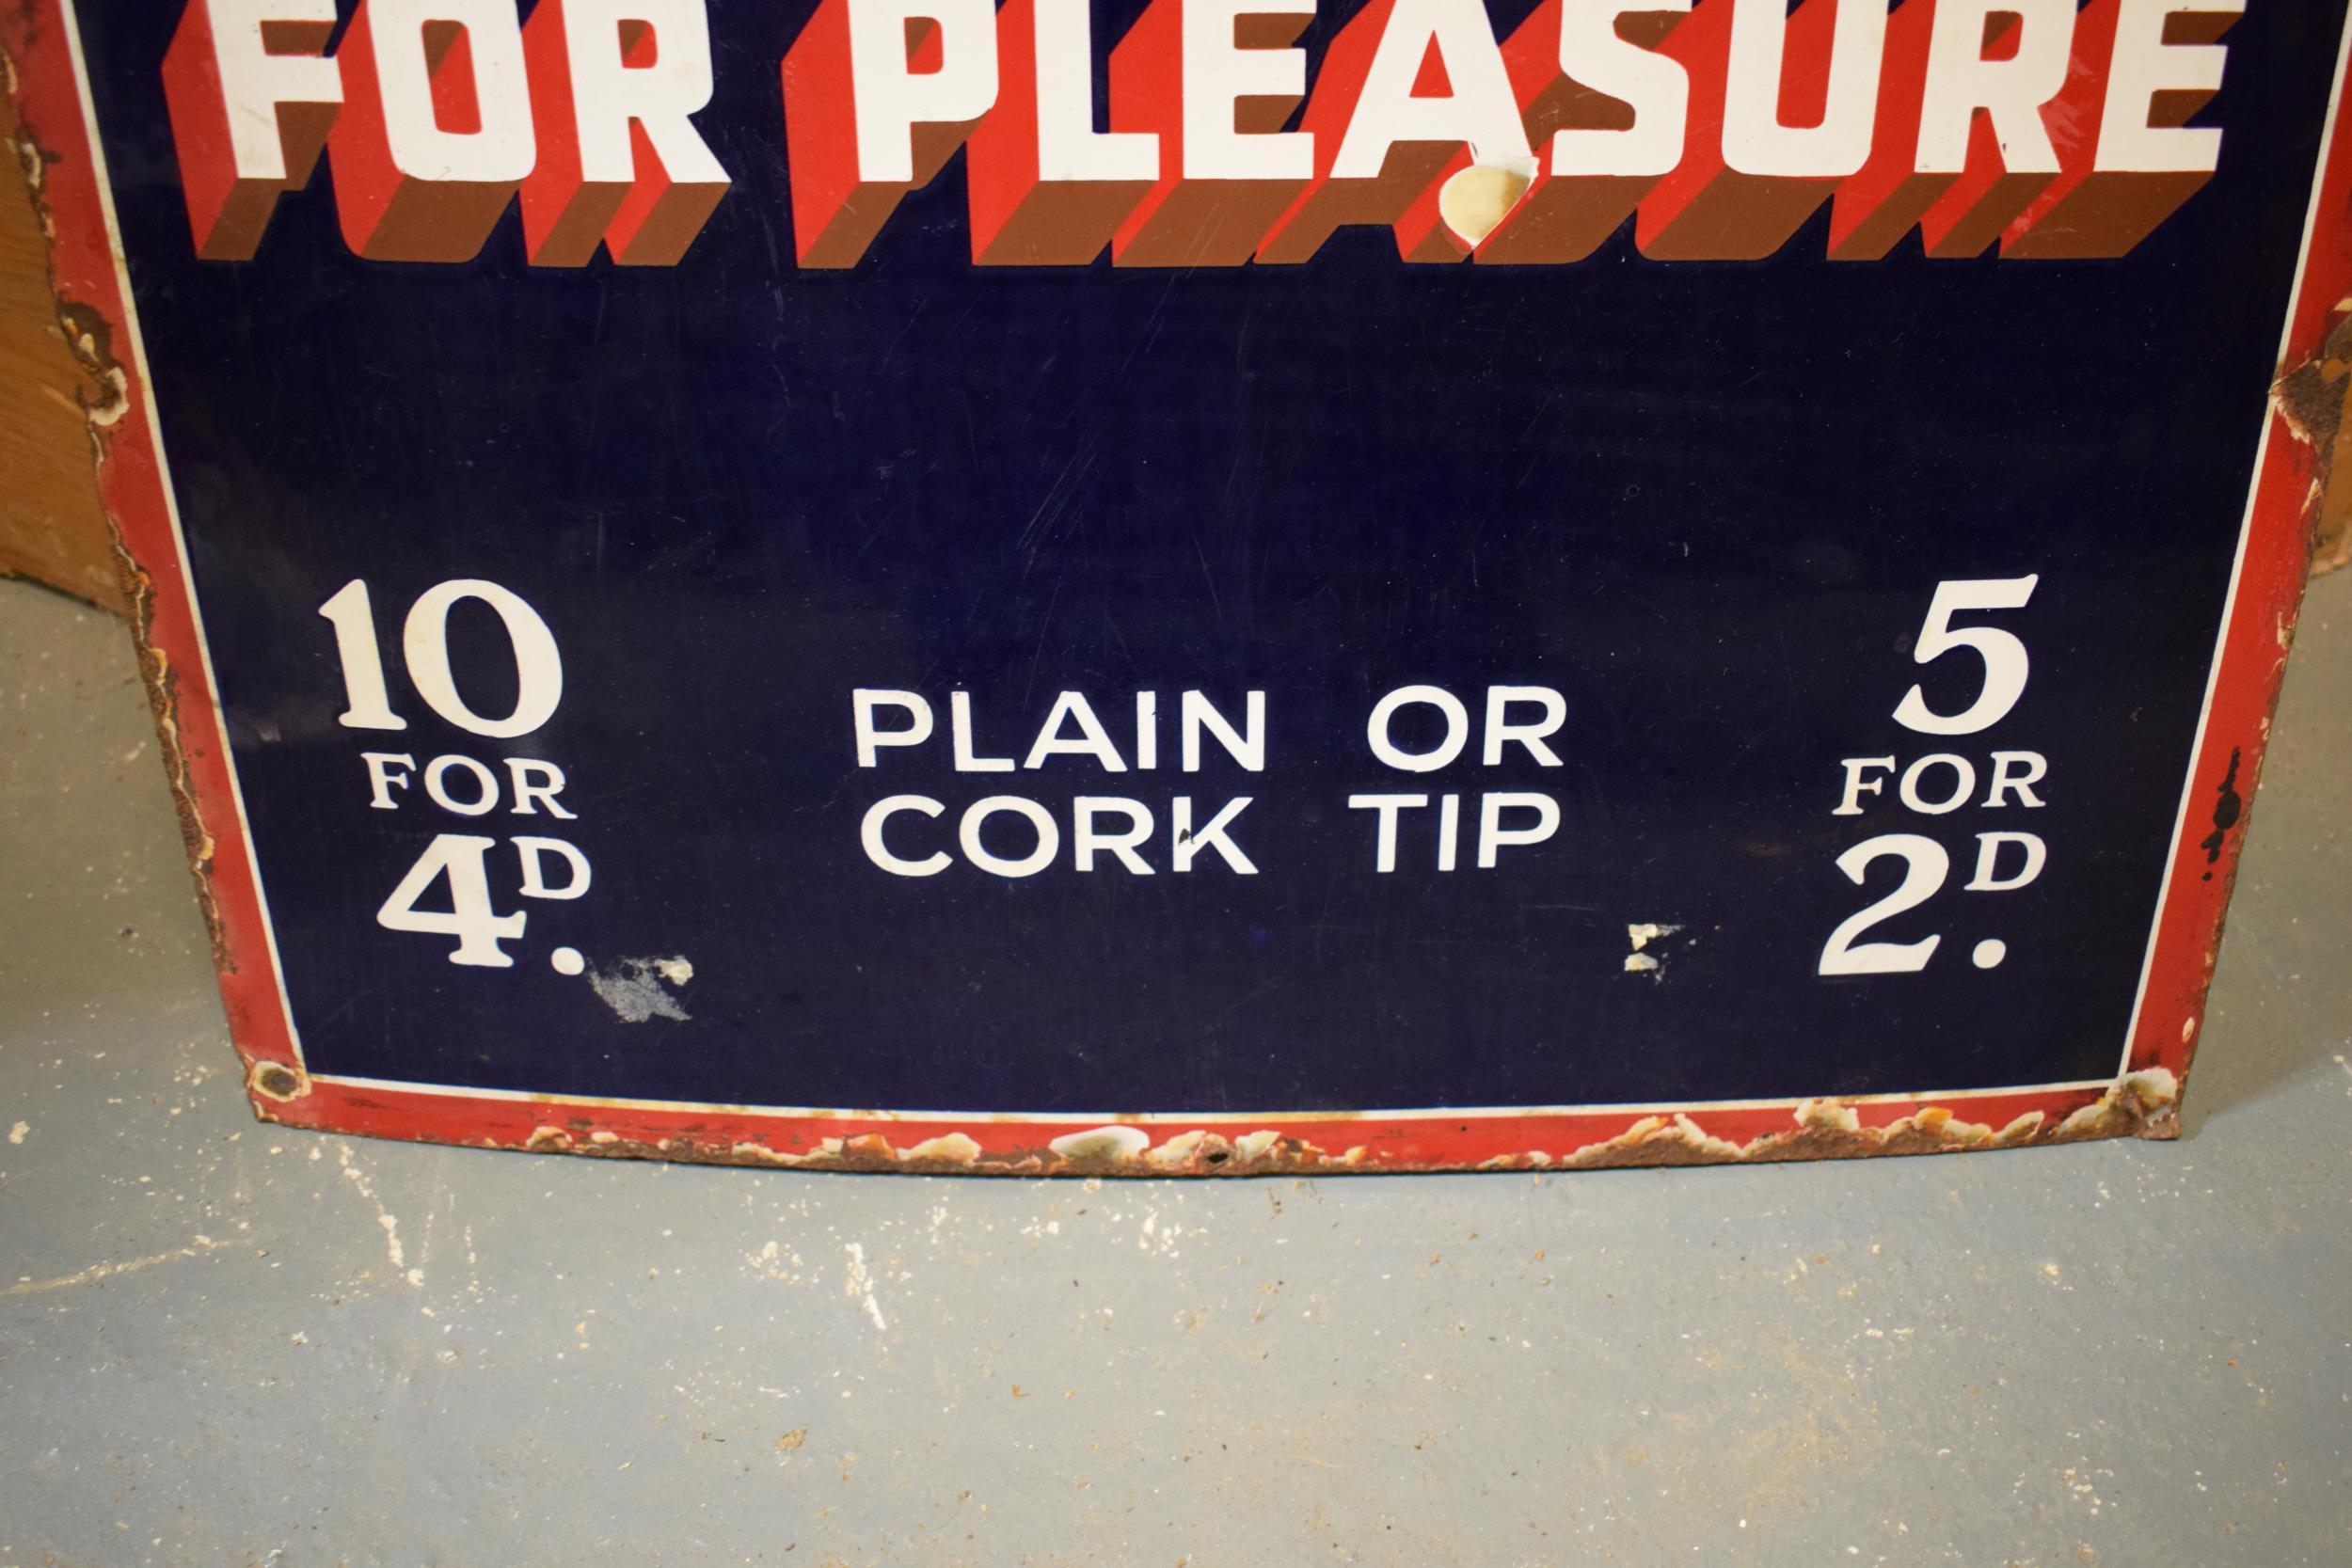 An original vintage enamel sign 'Park Drive For Pleasure, 10 for 4D, Plain or Cork Tip, 5 for 2D'. - Image 4 of 6